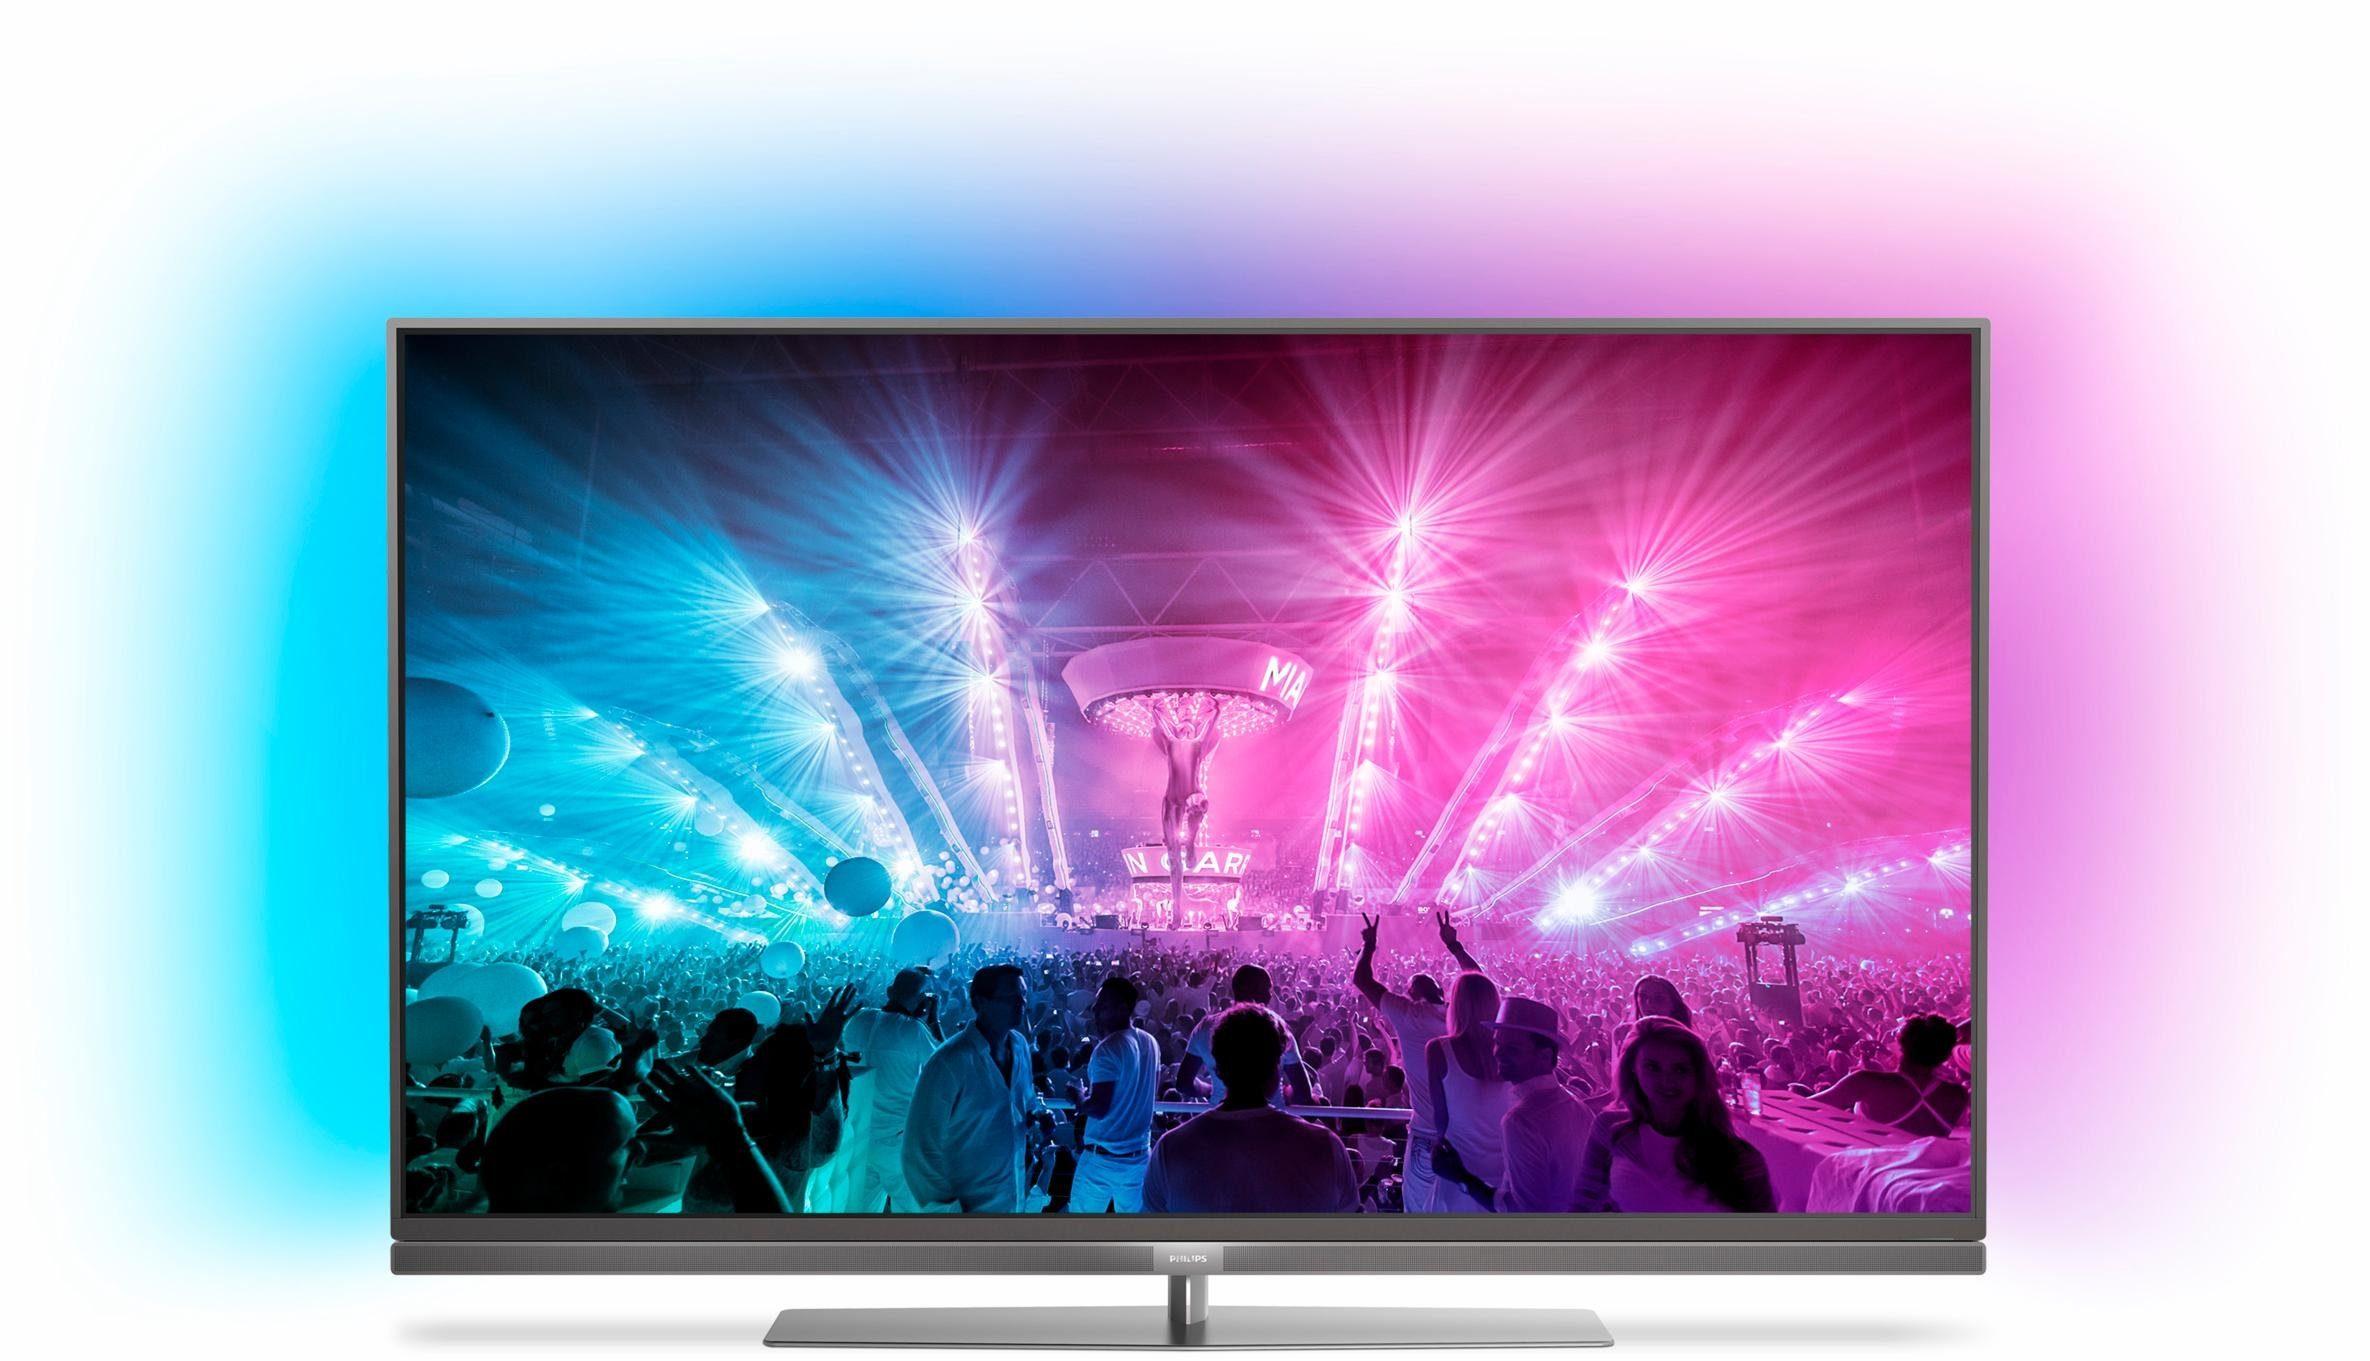 Philips 49PUS7181/12, LED Fernseher, 123 cm (49 Zoll), 2160p (4K Ultra HD) Ambilight, Smart-TV